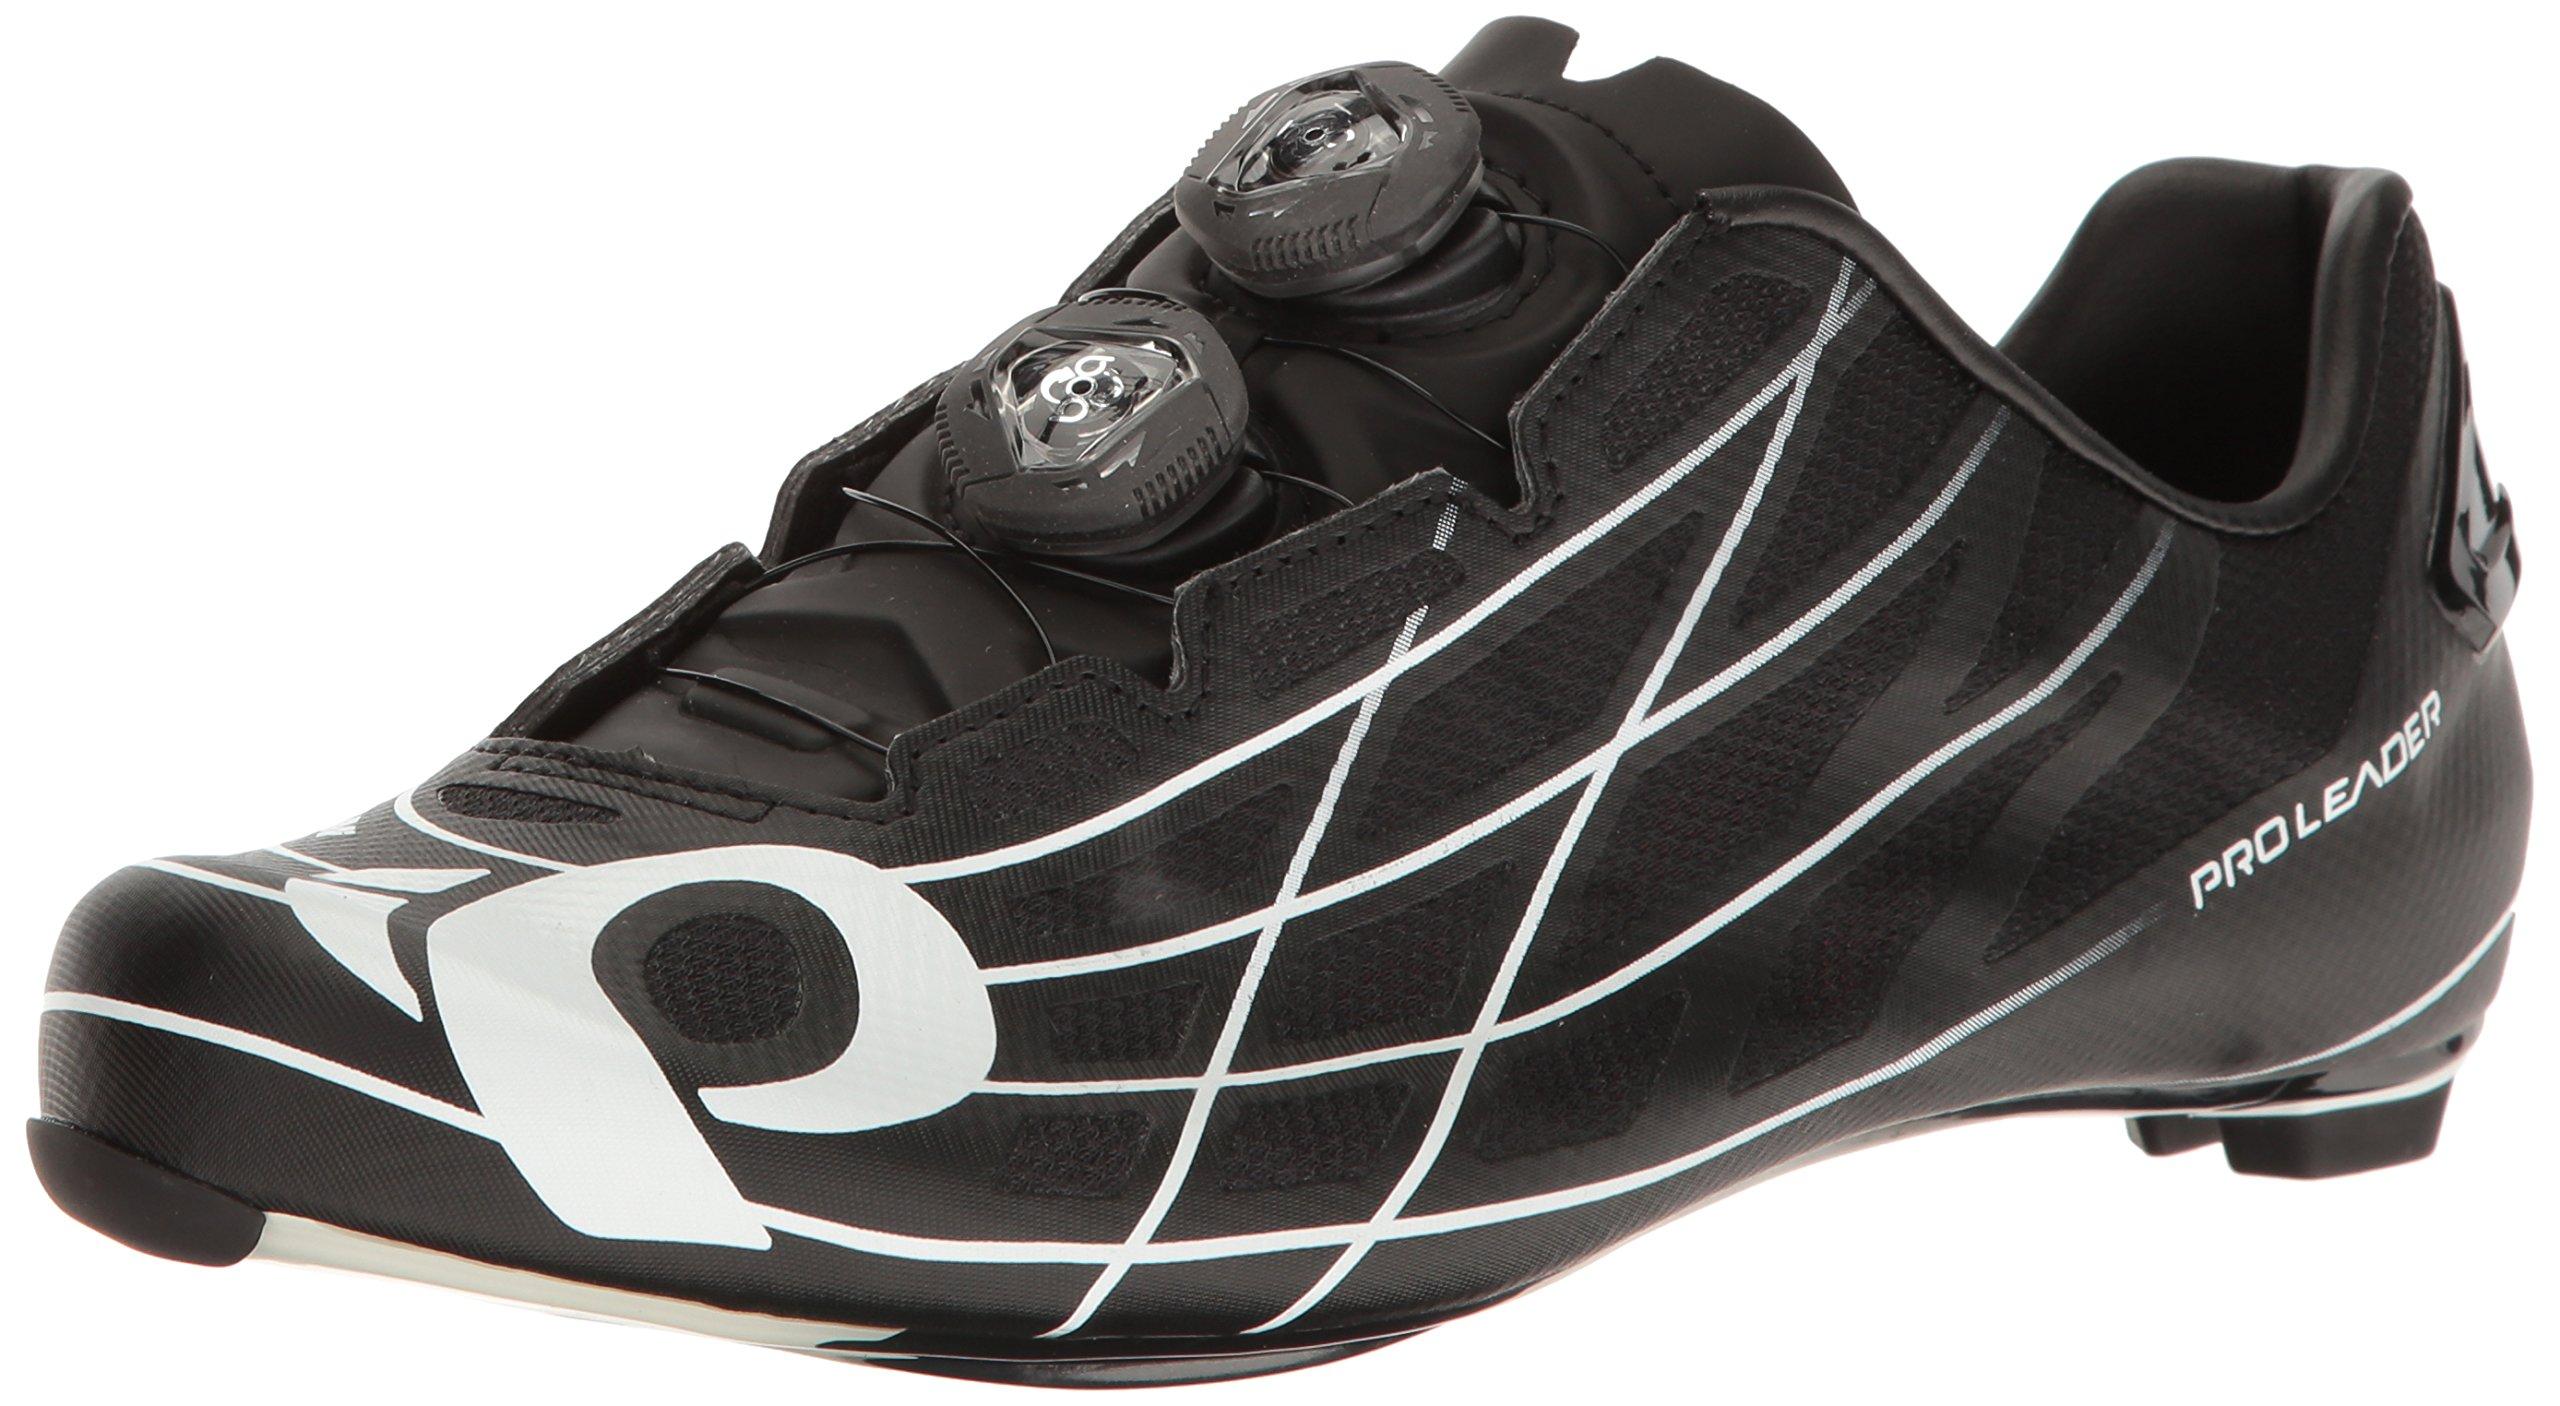 Pearl iZUMi Pro Leader III Cycling Shoe, Black/White, 43.5 EU/9.6 D US